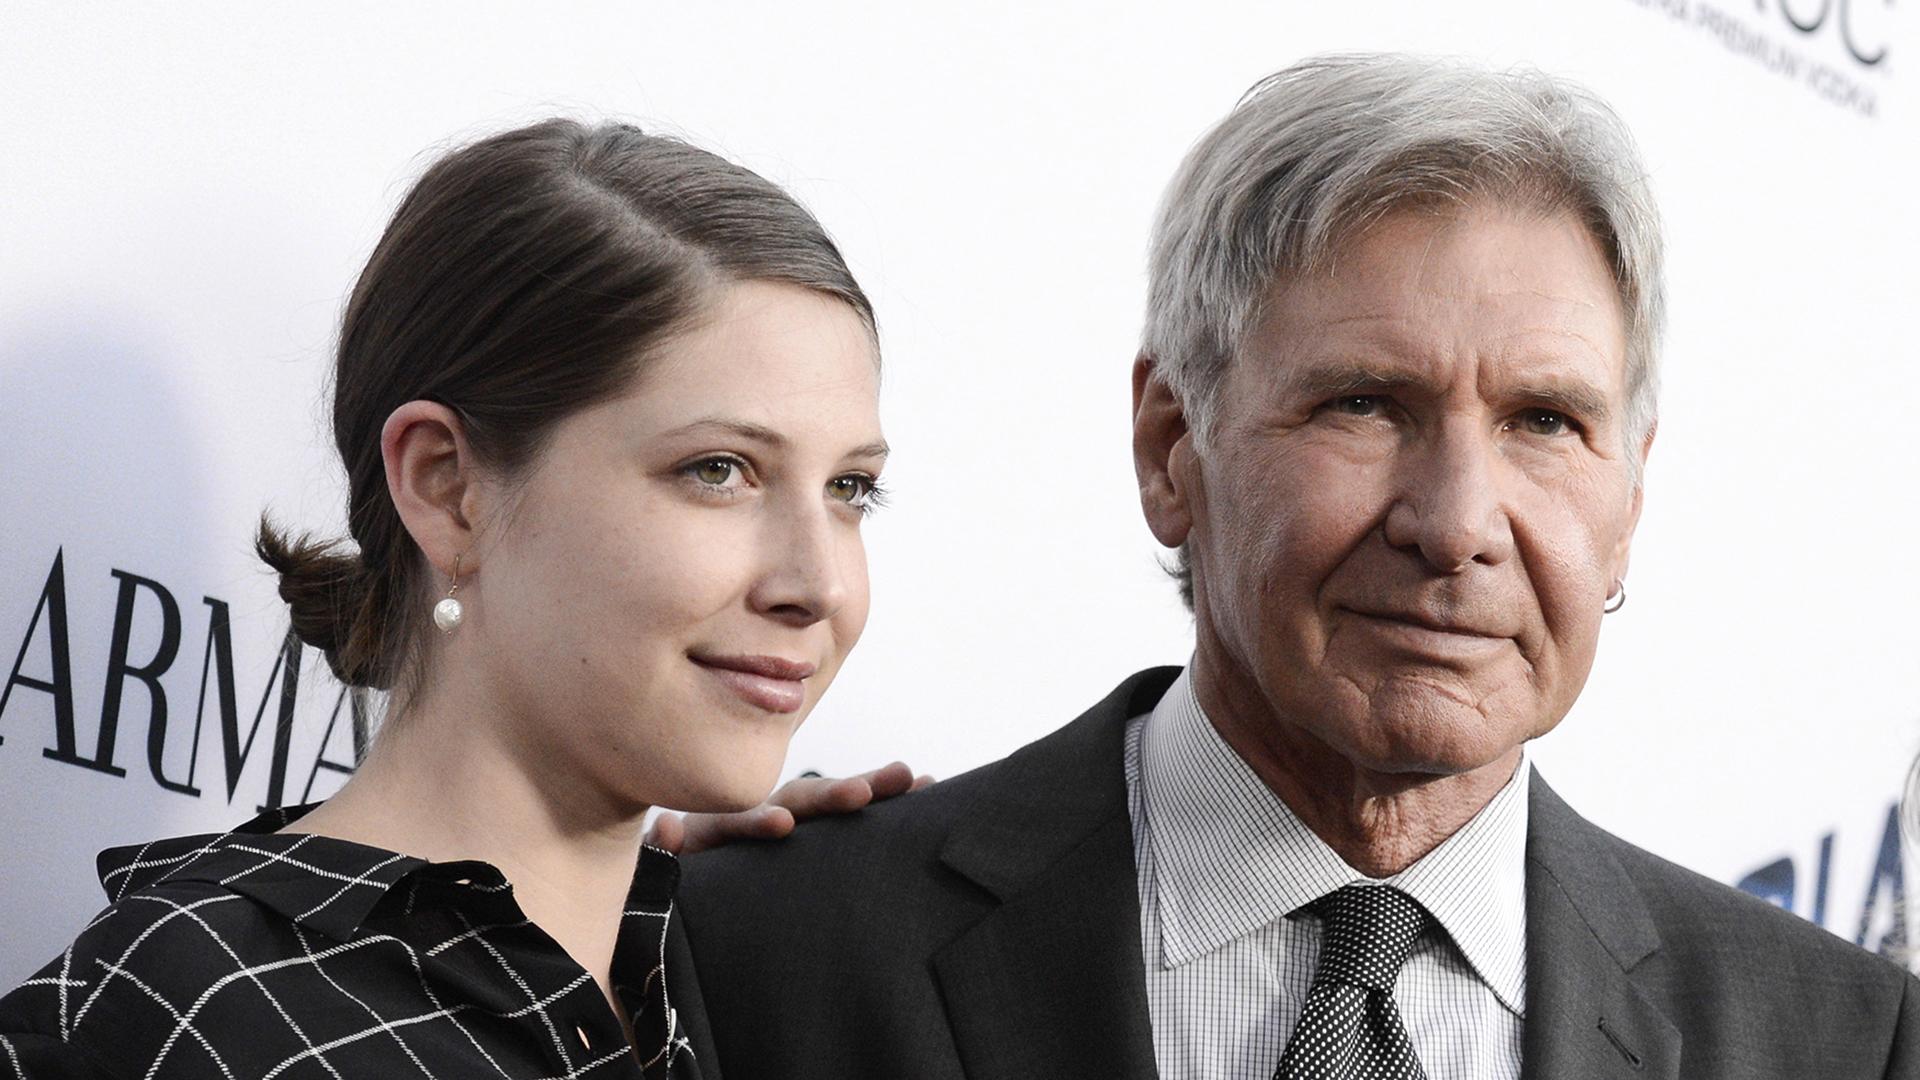 Hero Harrison Ford may die in the new series of Star Wars 02/19/2015 89